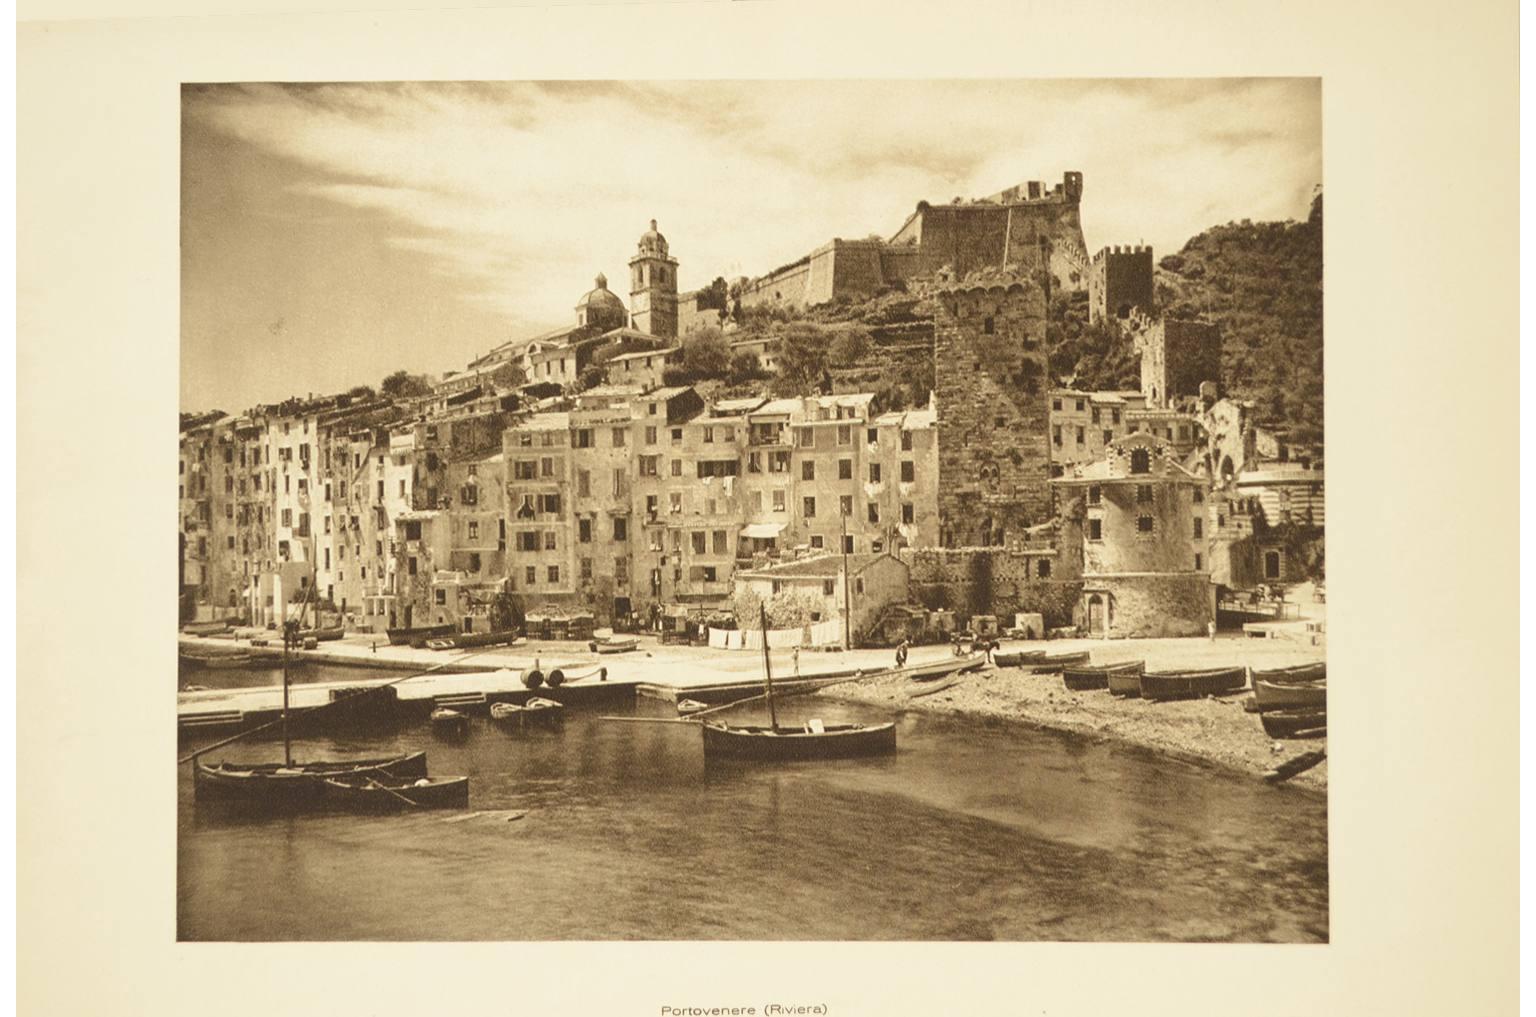 Antiquariato nautico/6089-Litografia Portovenere